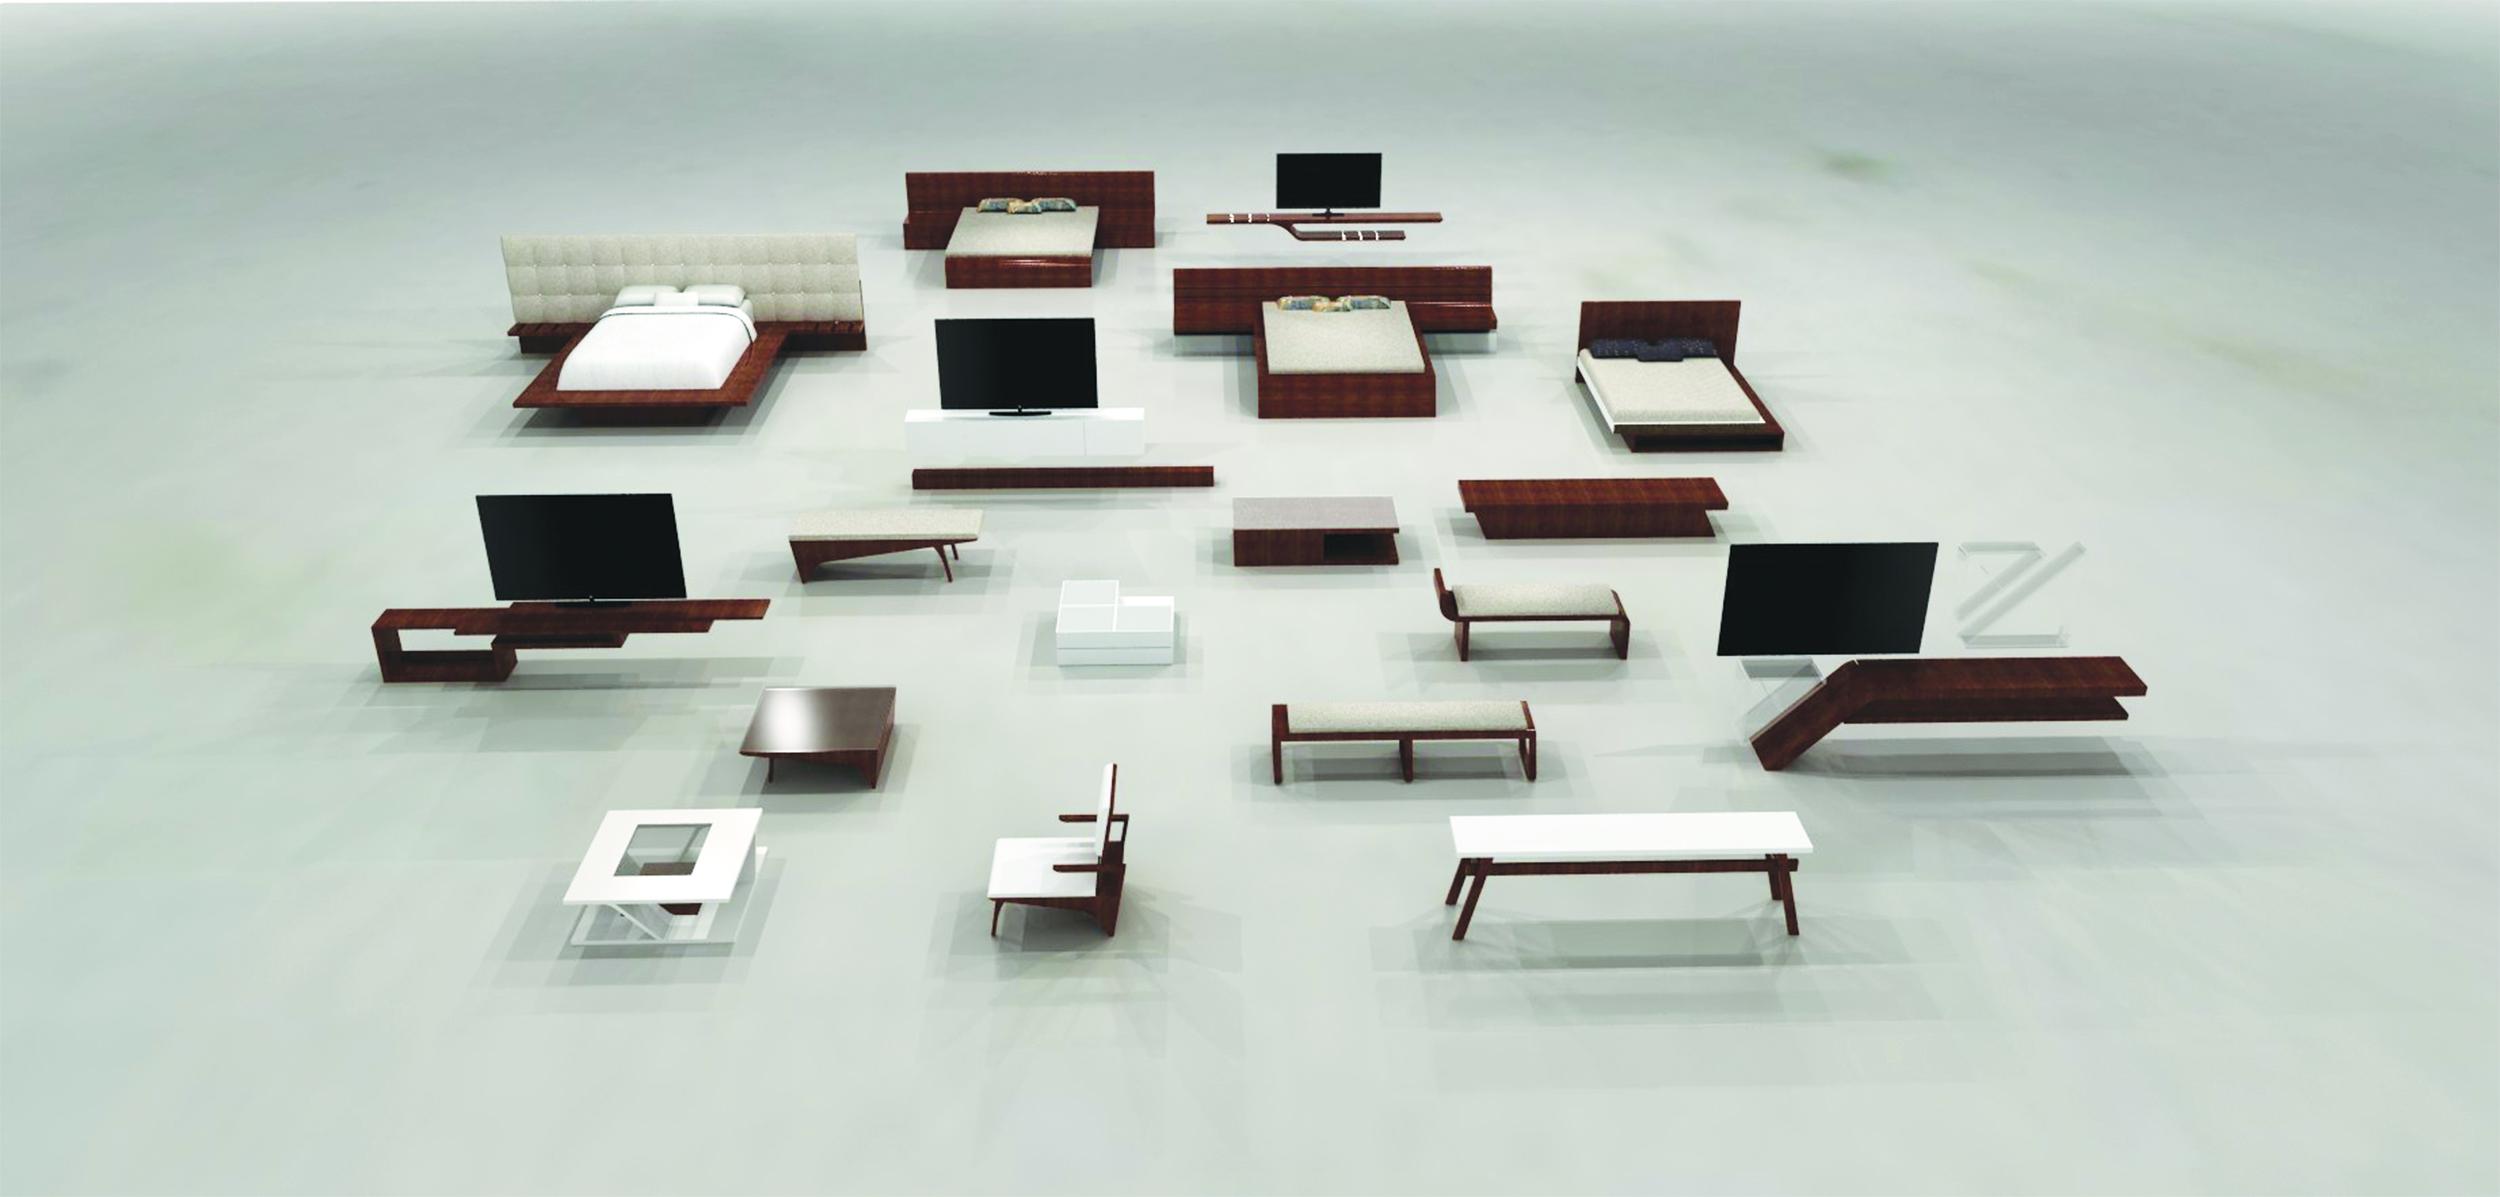 Furniture Collage_02.jpg